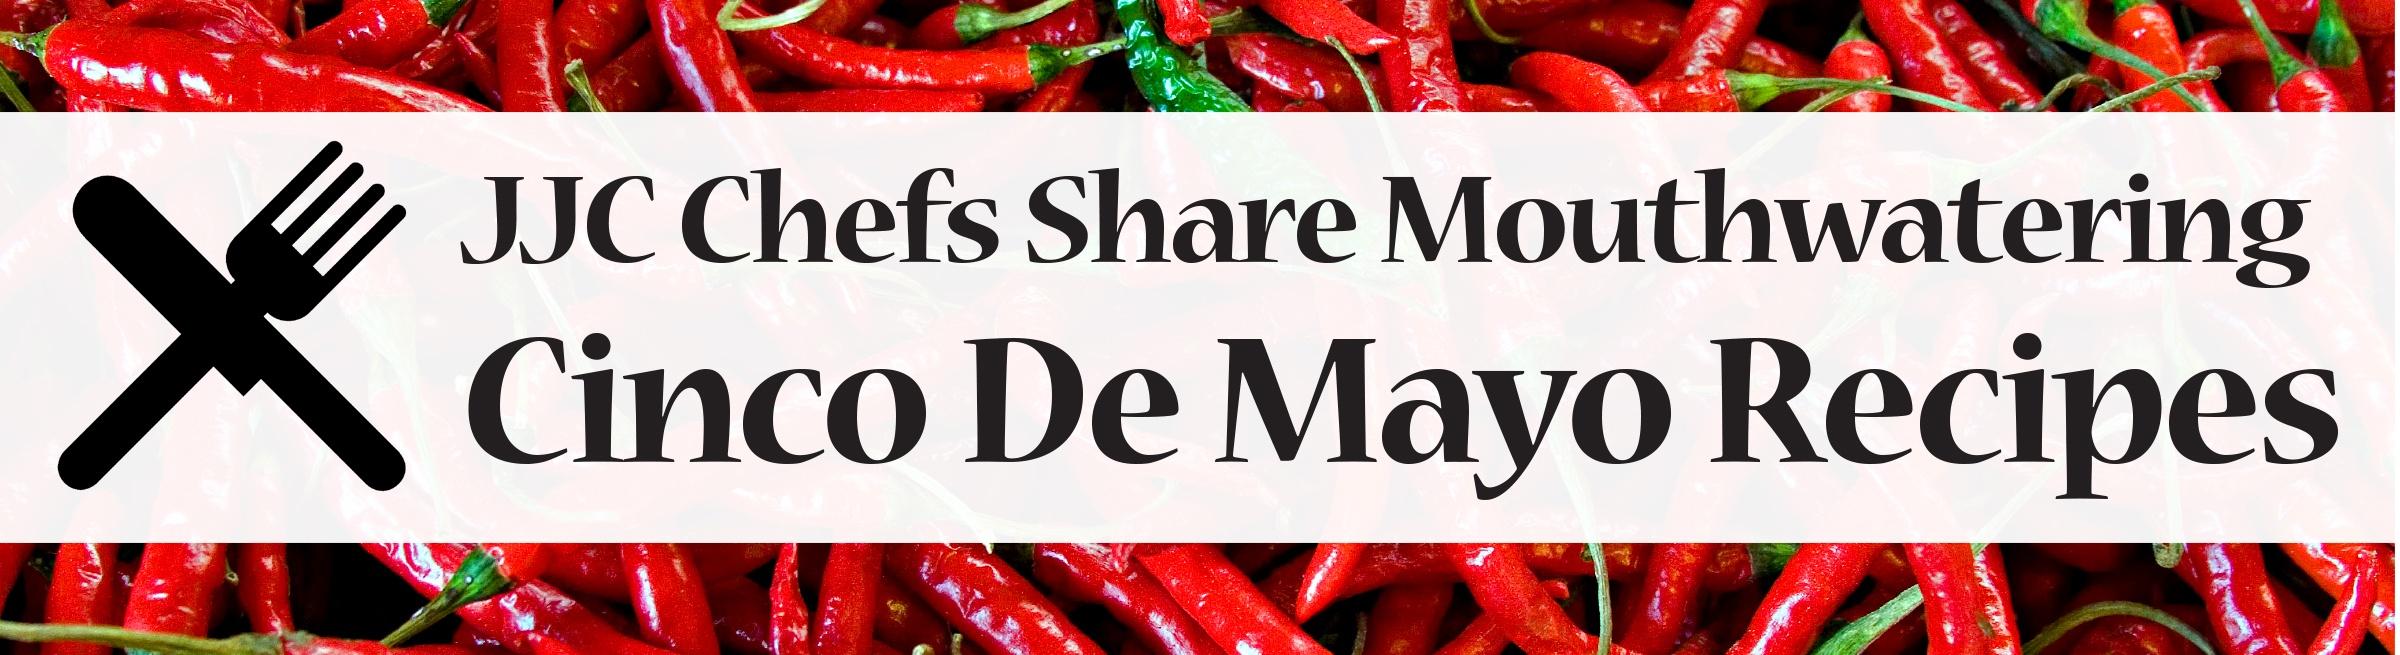 jjc chefs share mouthwatering cinco de mayo recipes joliet junior college culinary arts